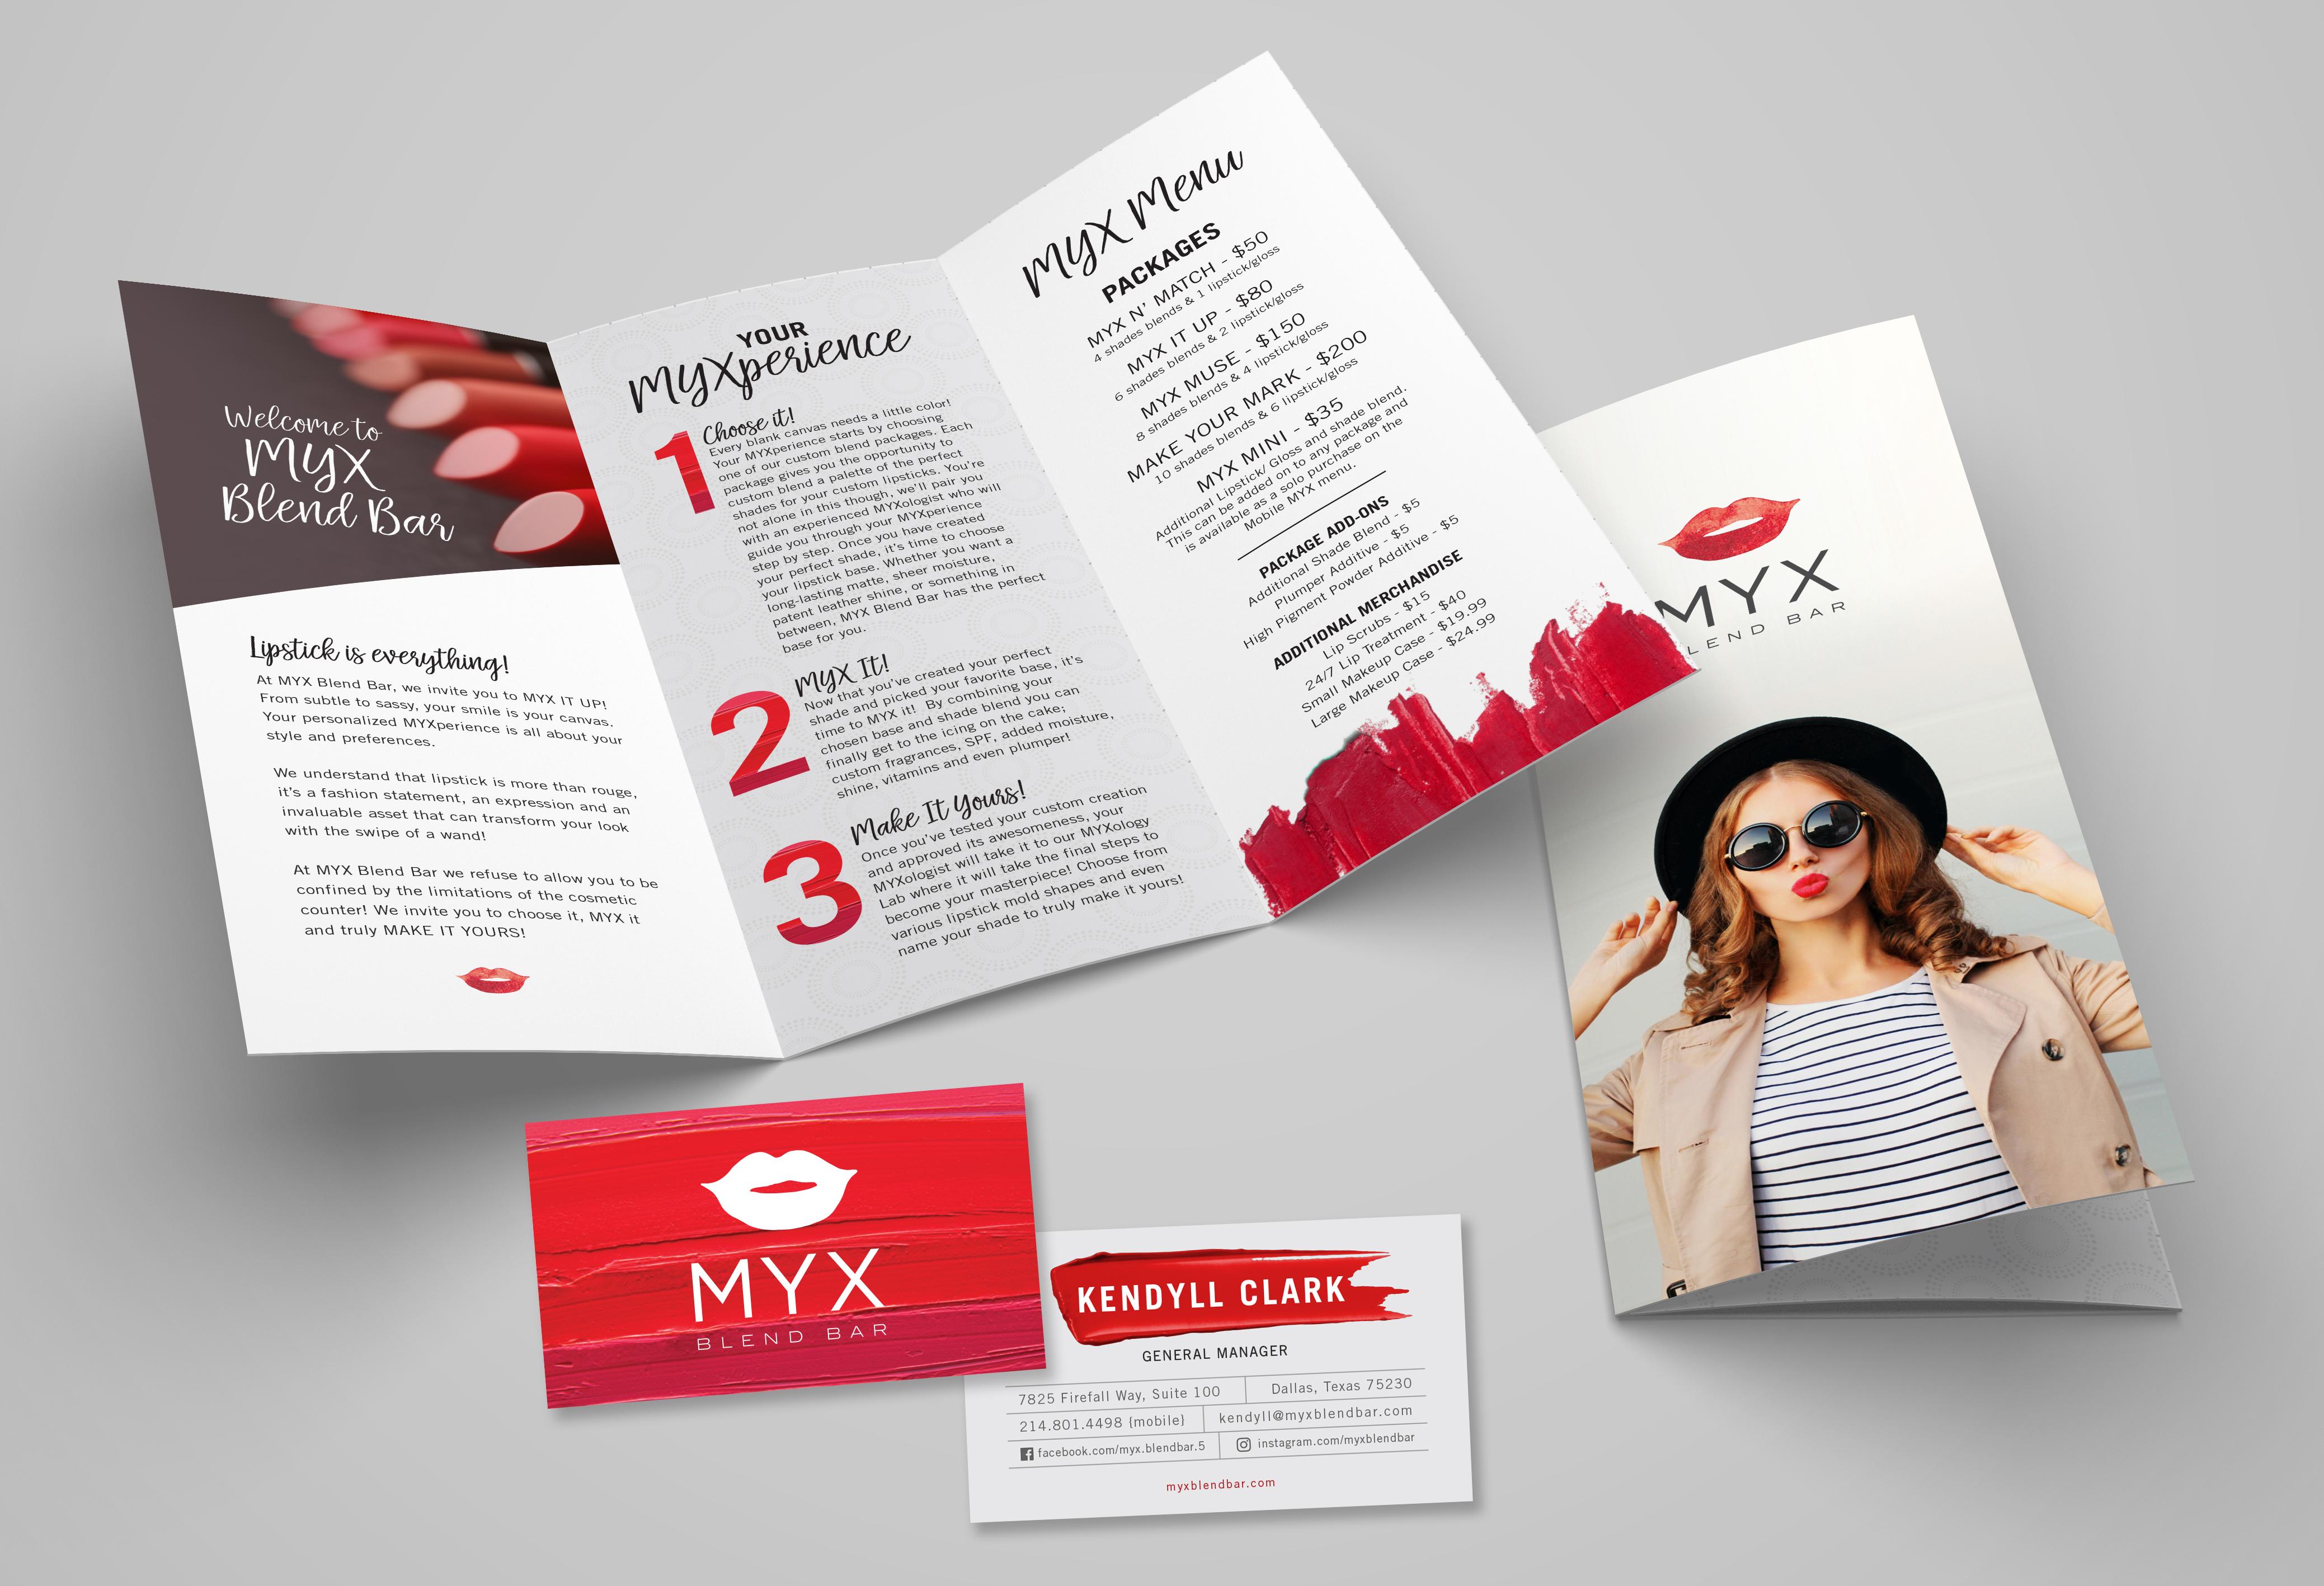 MYX Blend Bar Print